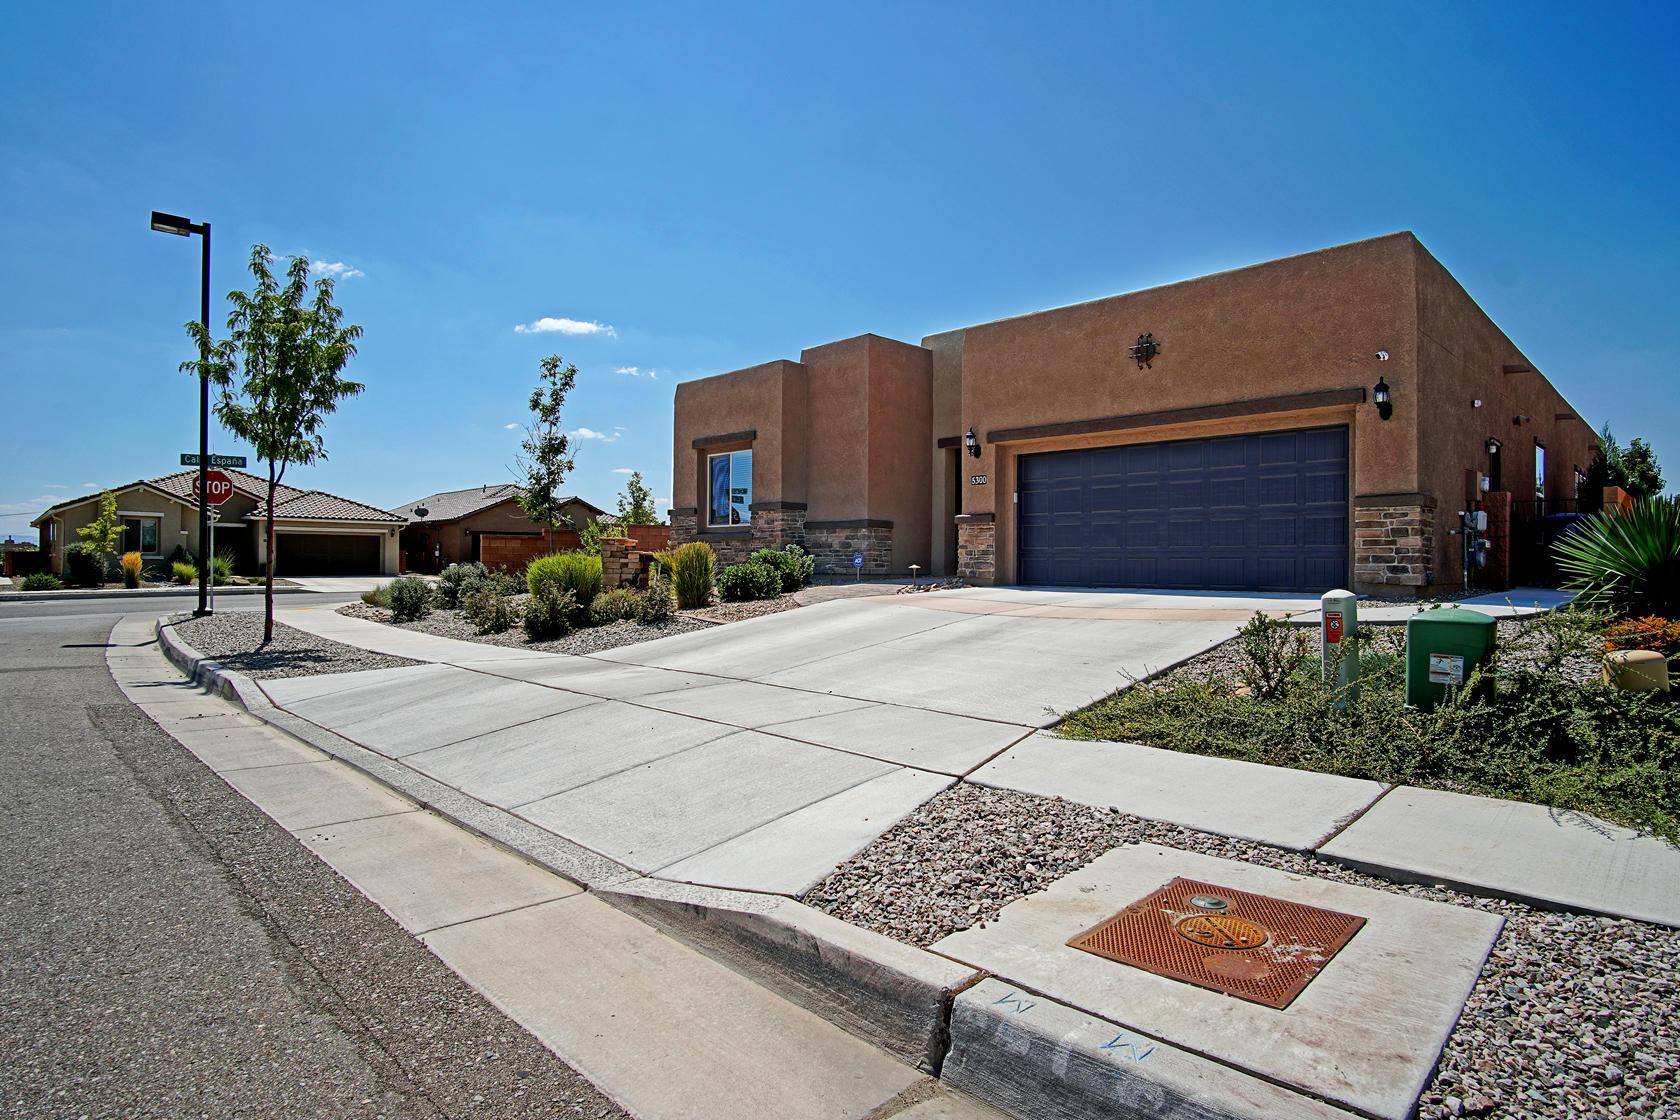 5300 NW Calle Giralda, Northwest Albuquerque and Northwest Heights, New Mexico